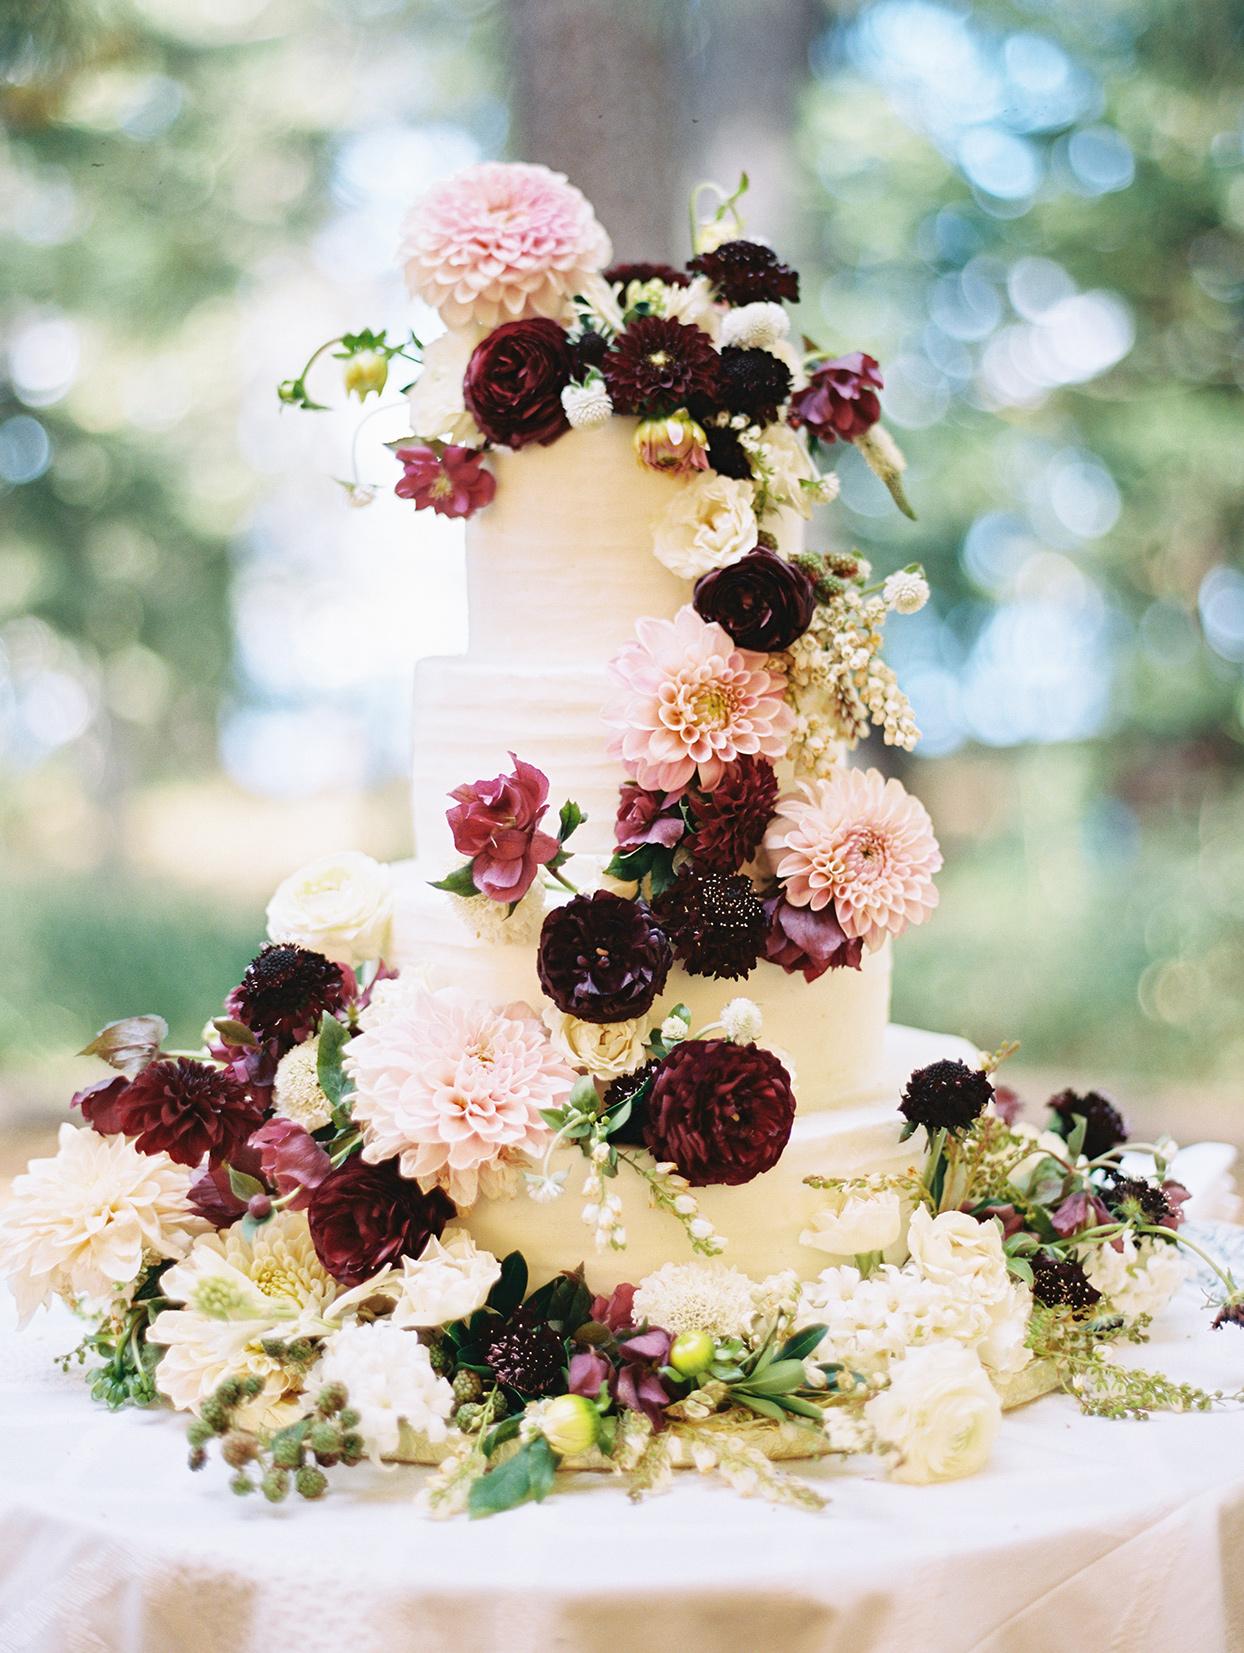 white wedding cake with garland of purple, burgundy and cream flowers